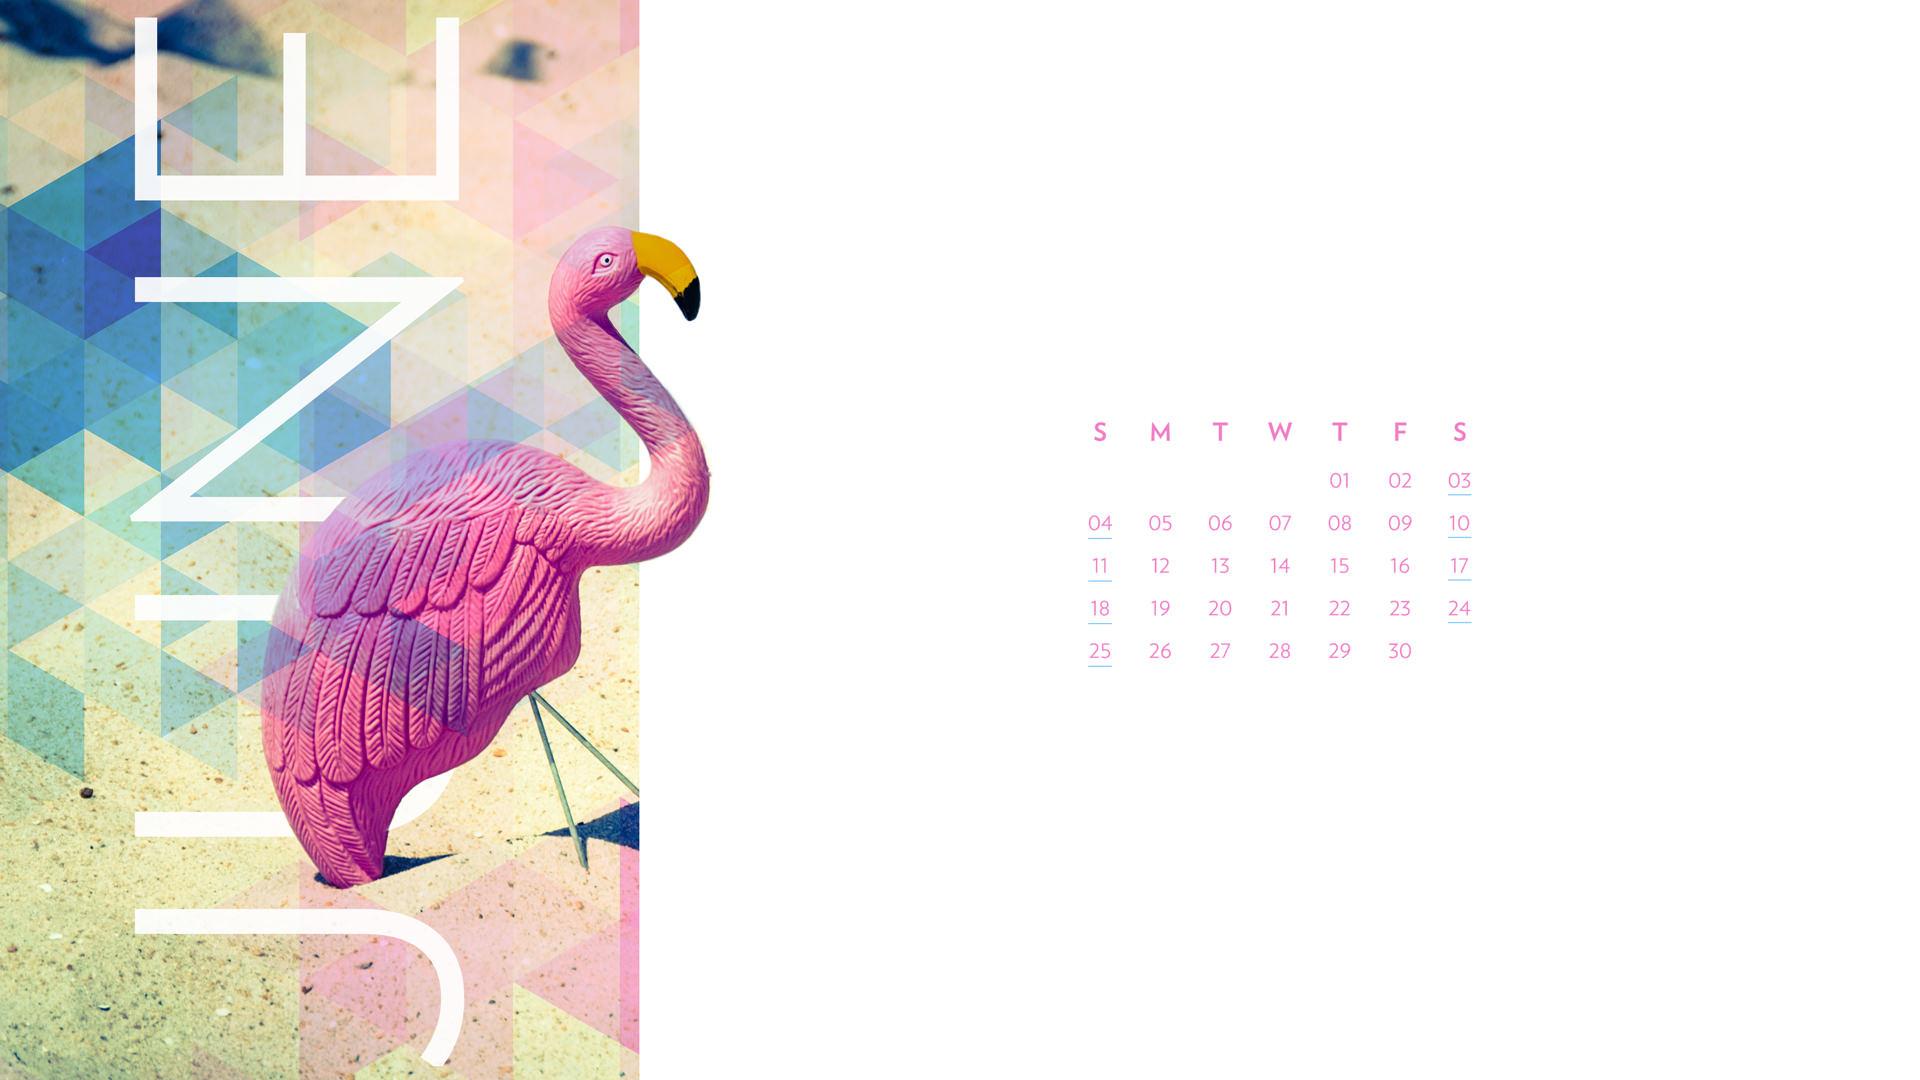 June 2017 Desktop Calendar Wallpaper Paper Leaf 1920x1080